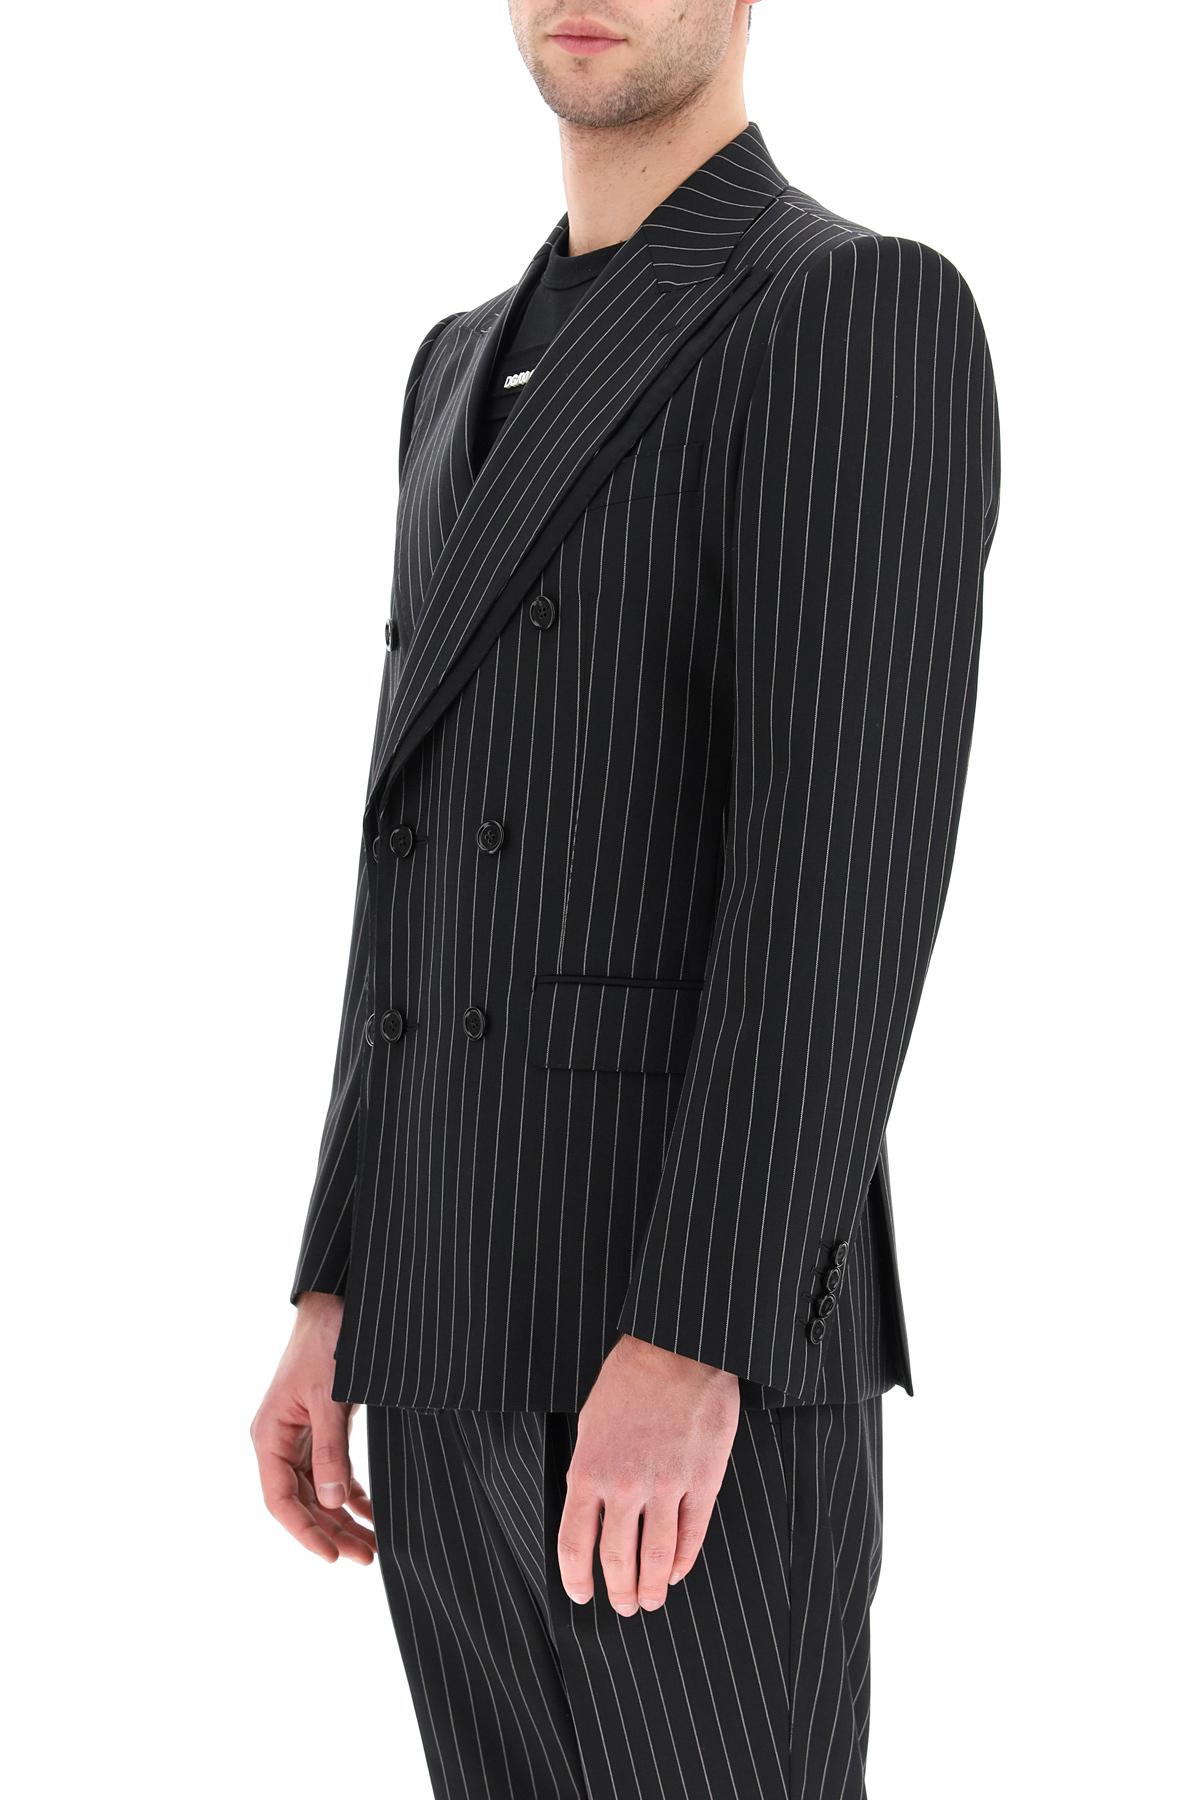 Dolce & gabbana blazer tailored in lana gessata